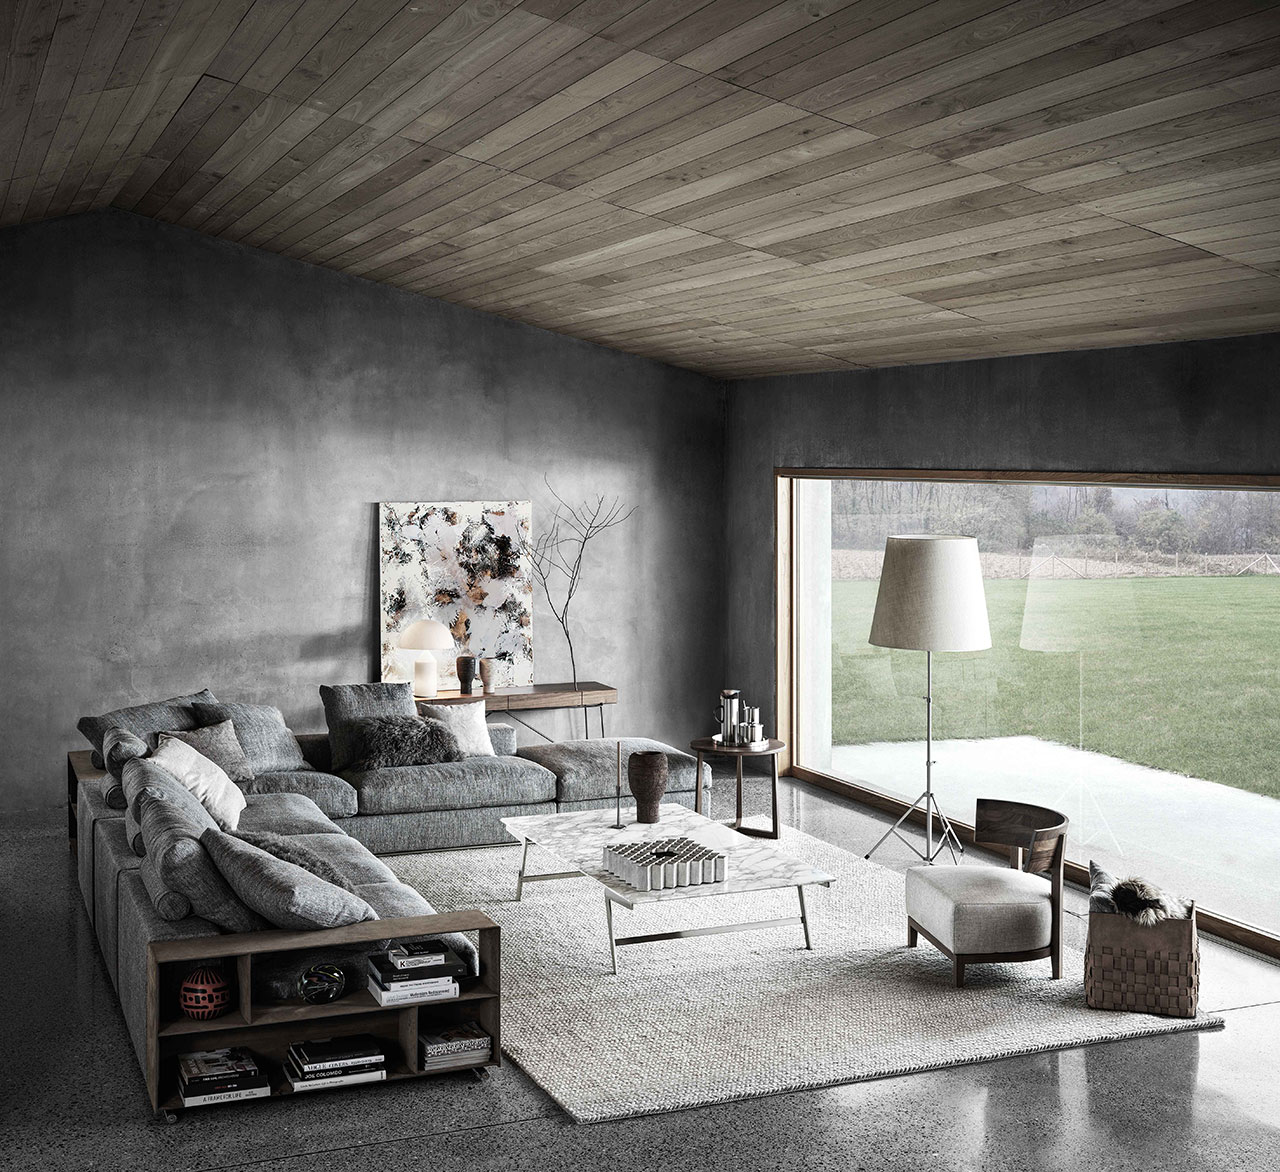 Groundpiece sofa by Antonio Citterio for Flexform. Photo© Flexform.